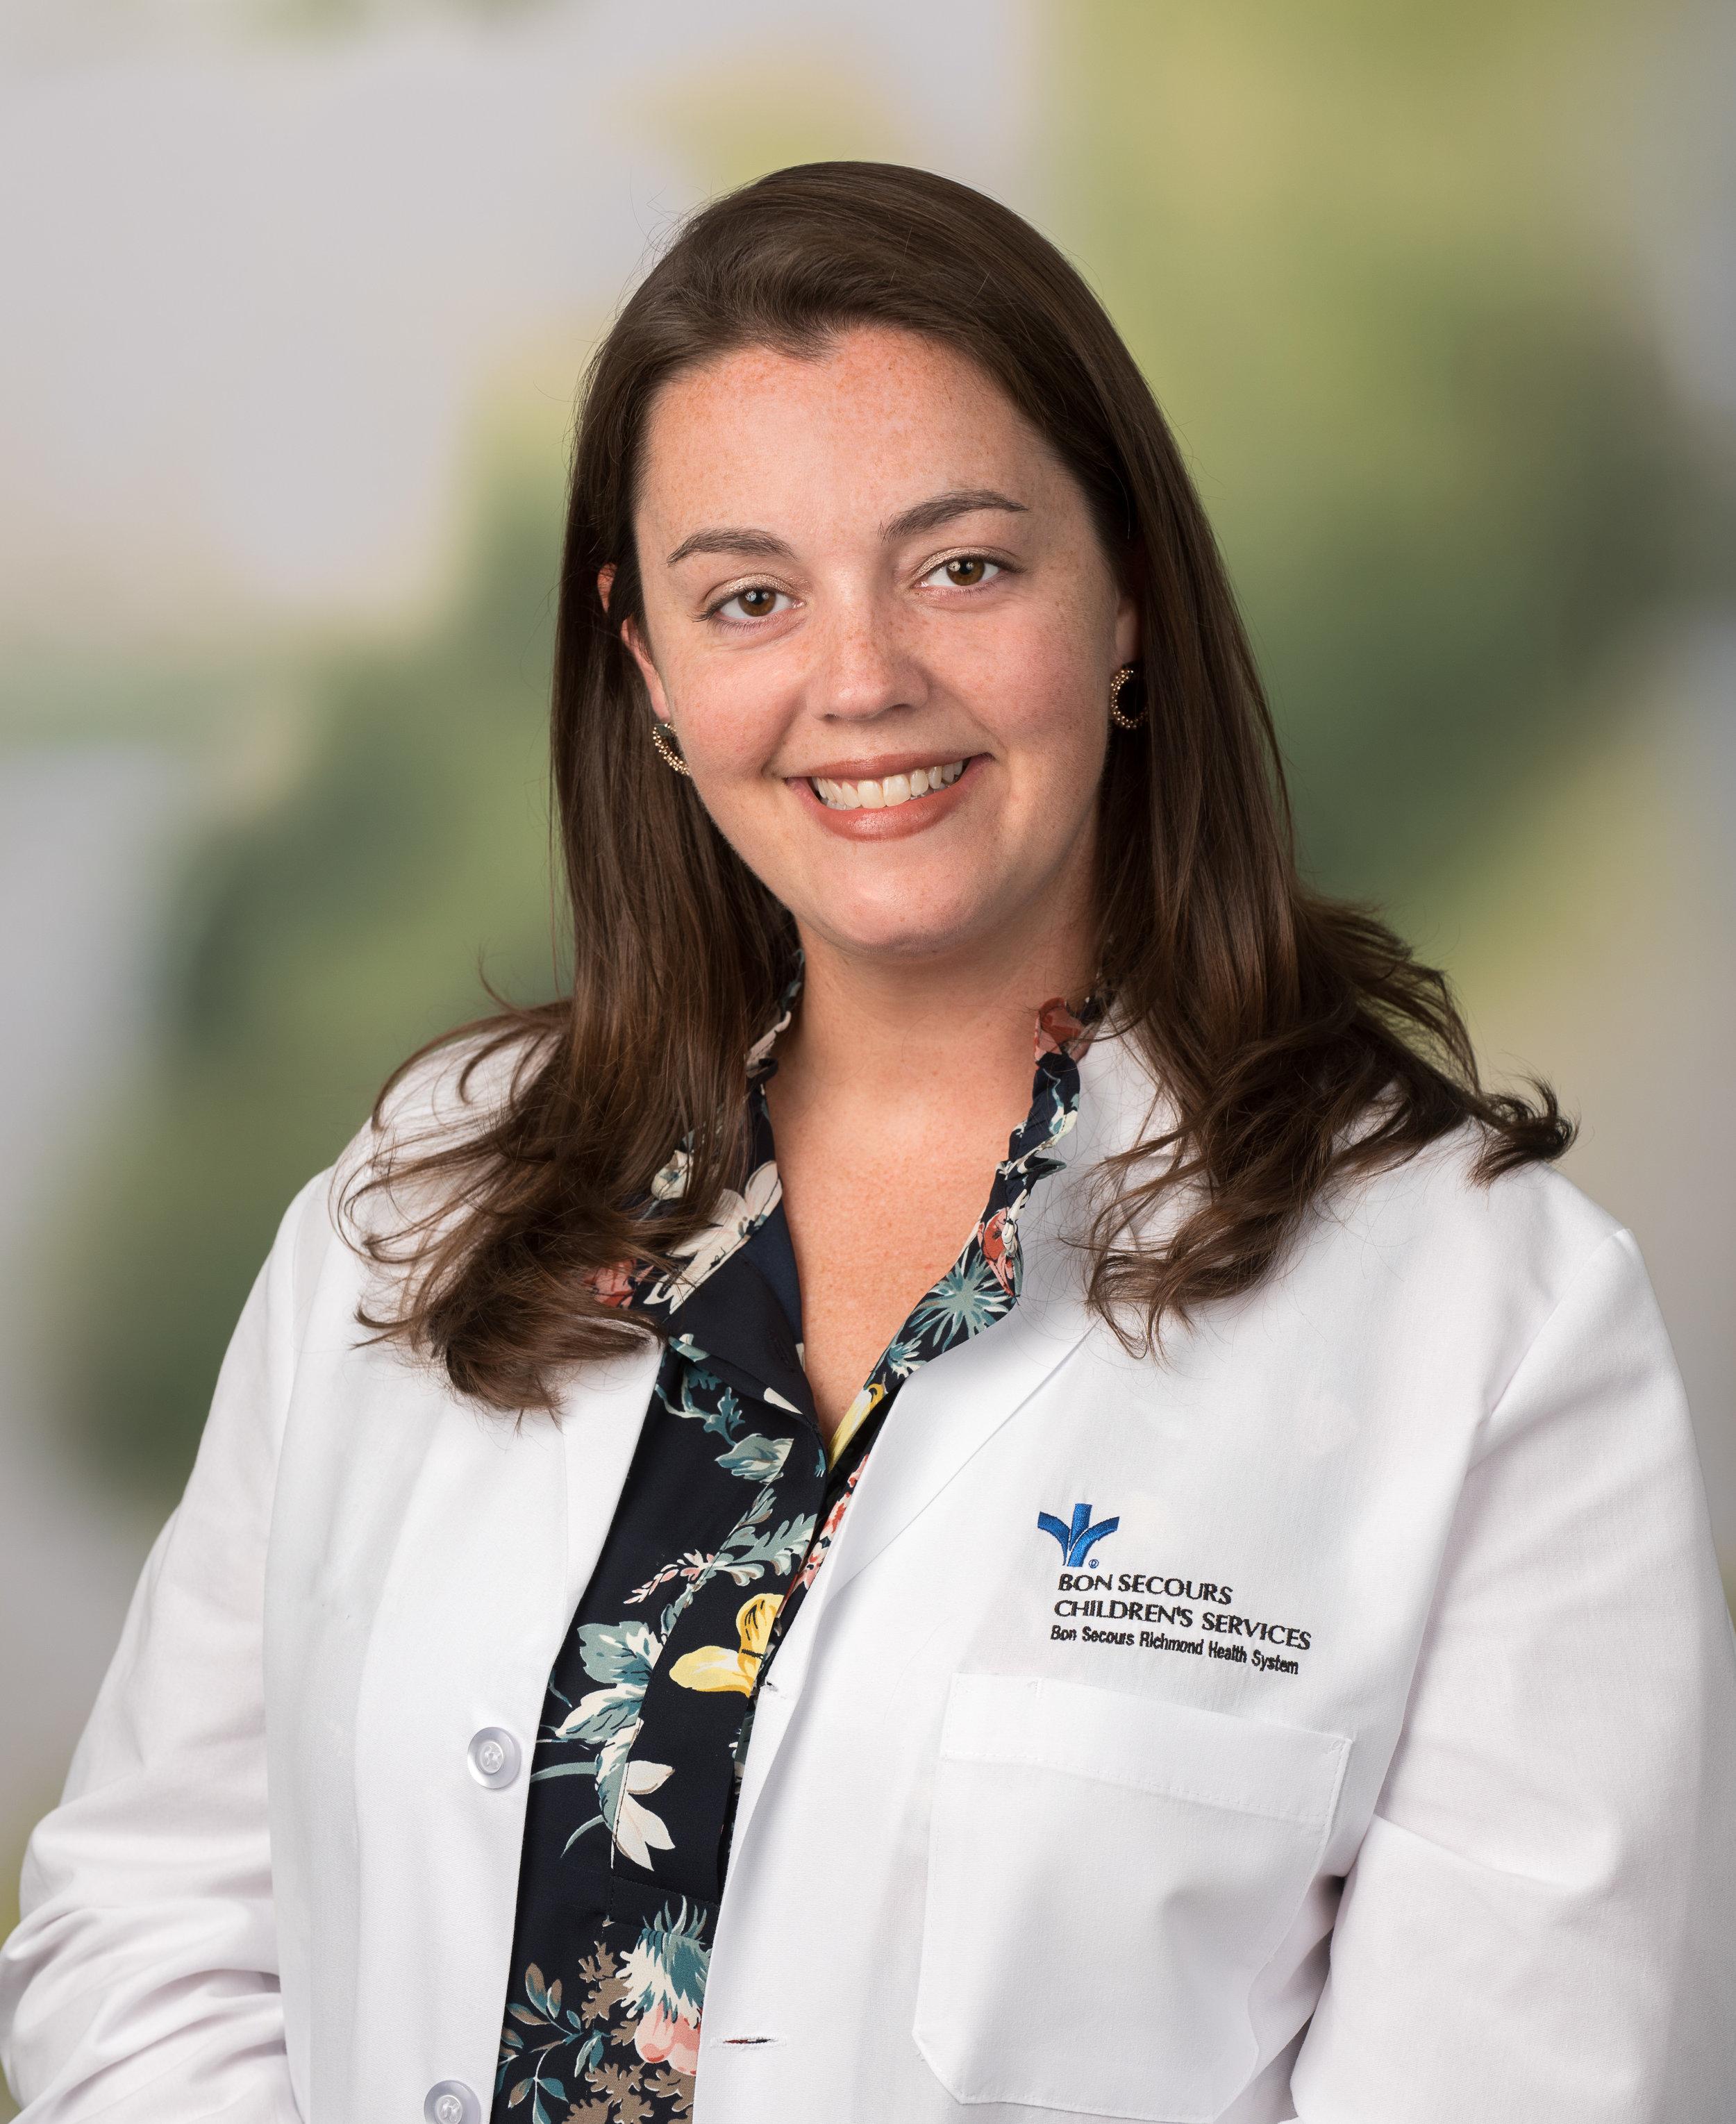 Kelly K. Lastrapes, MD